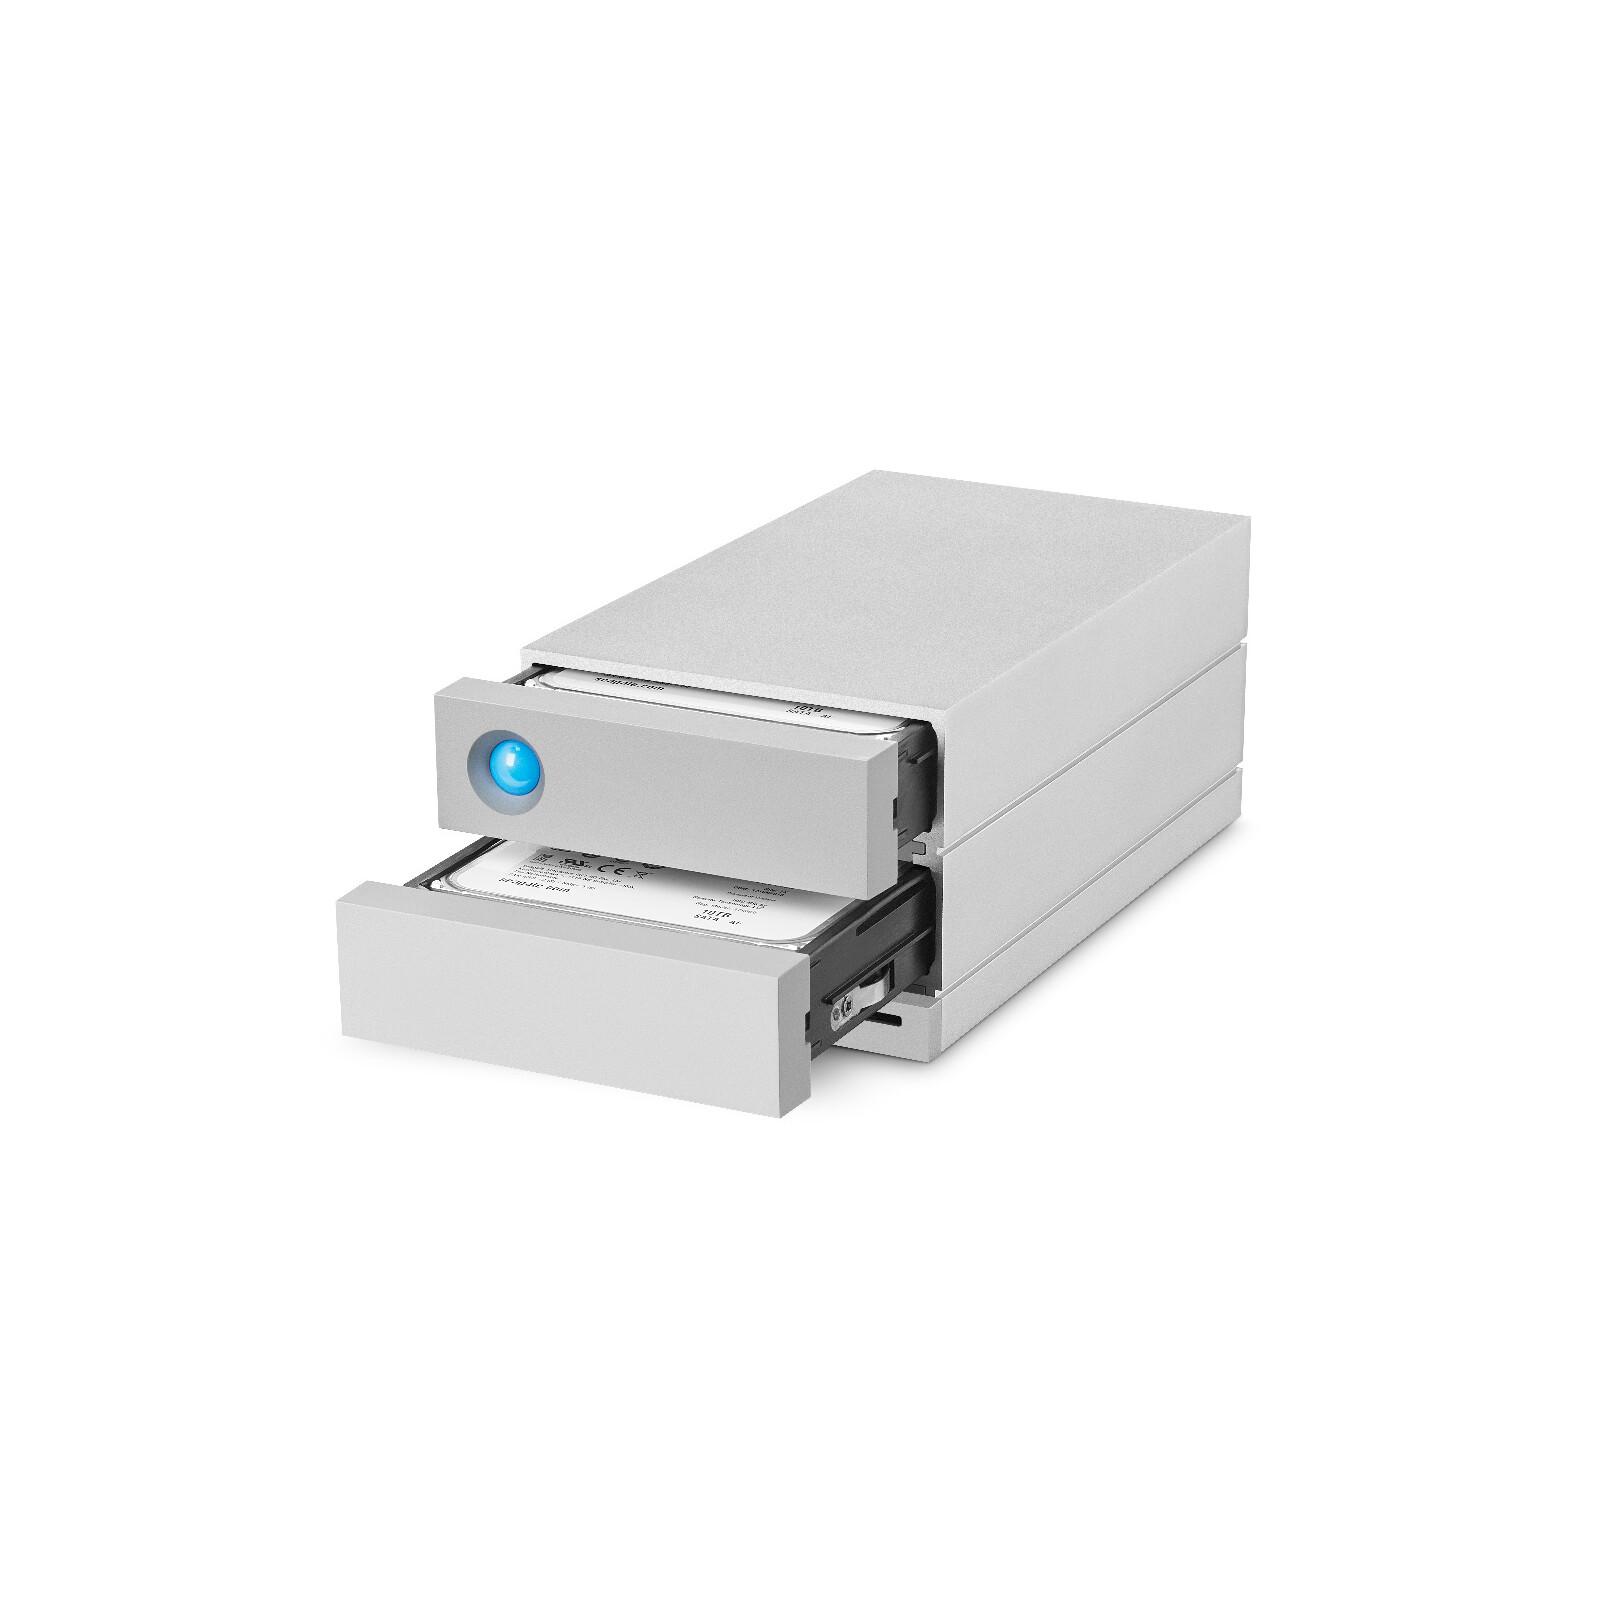 LaCie 2big Dock 20TB Thunderbolt 3, DAS